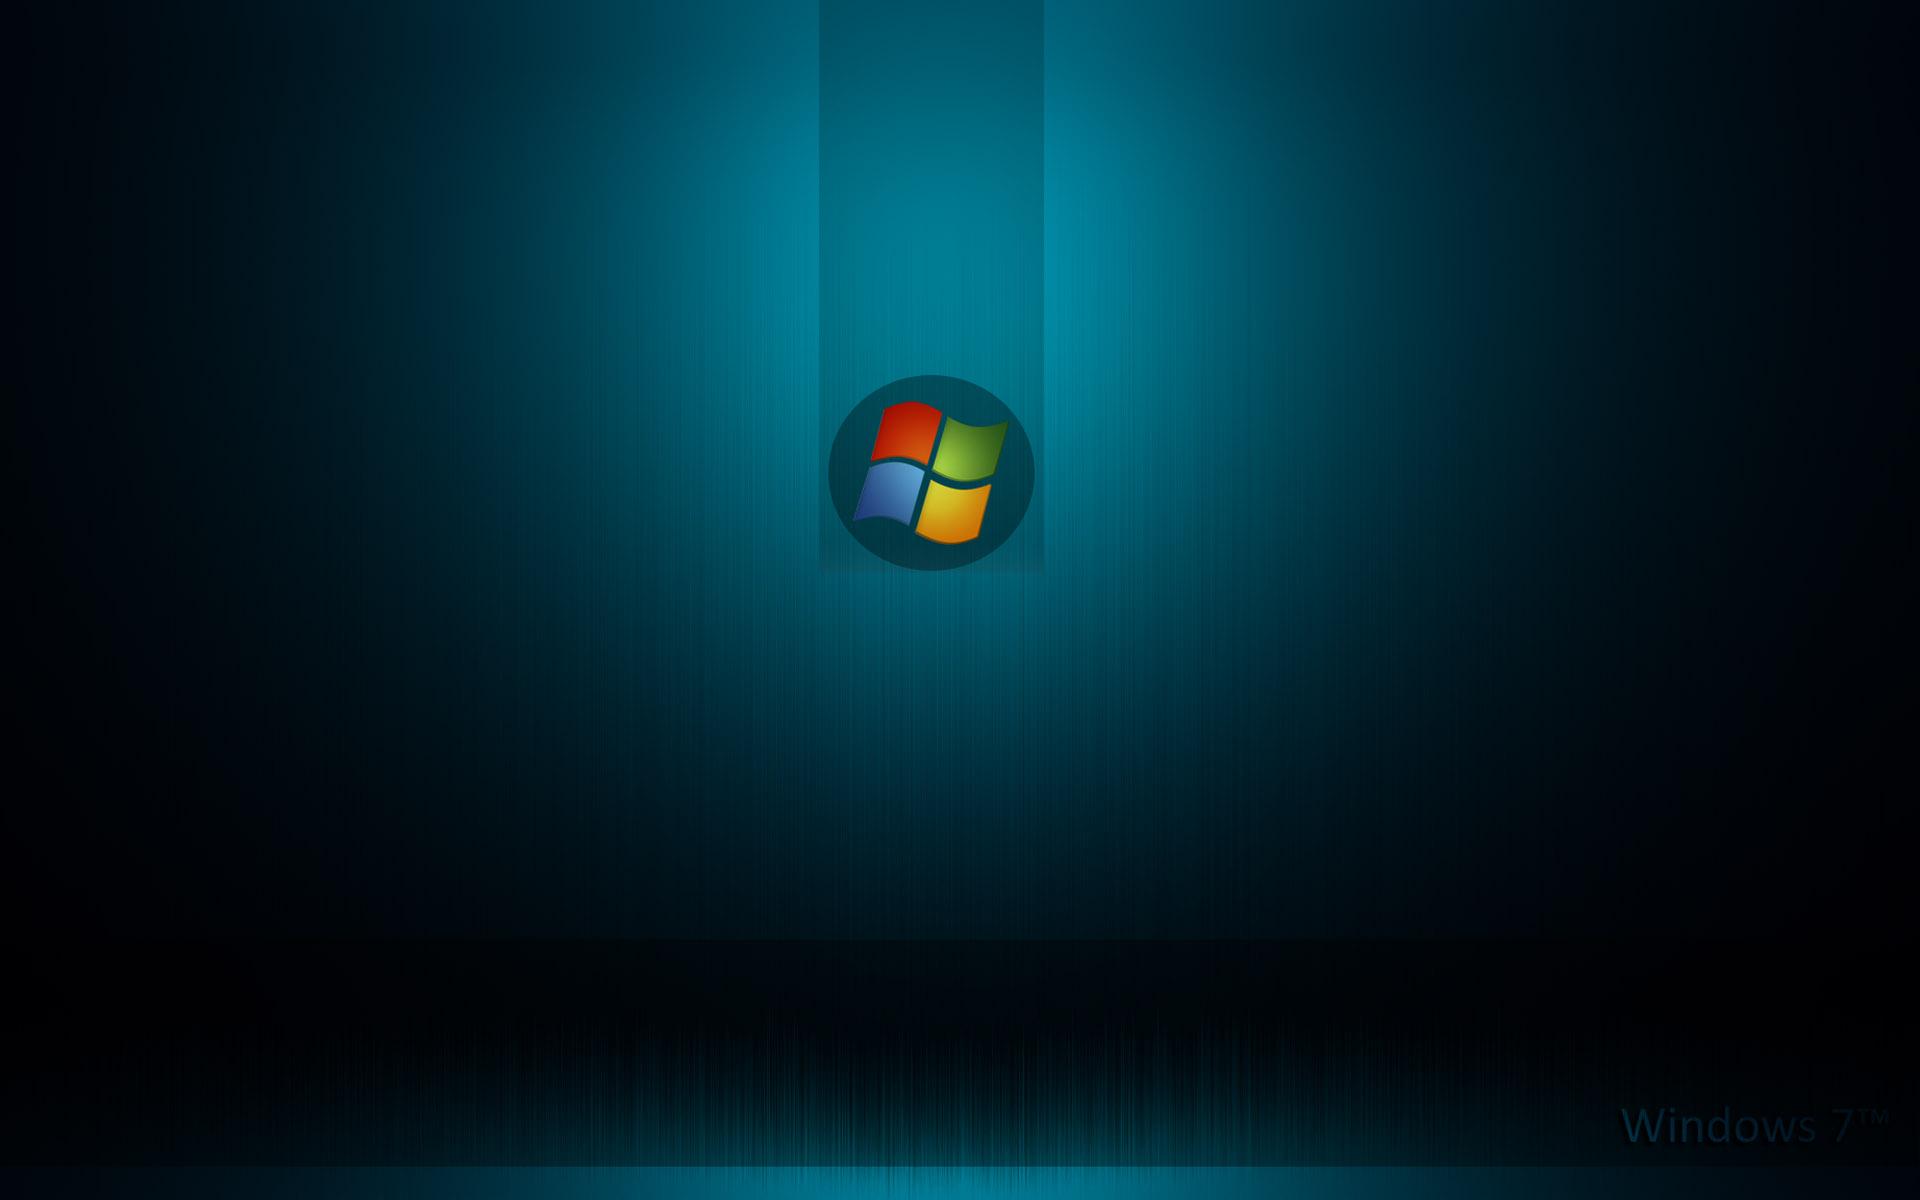 Windows Desktop Wallpaper - Windows 7 - HD Wallpaper